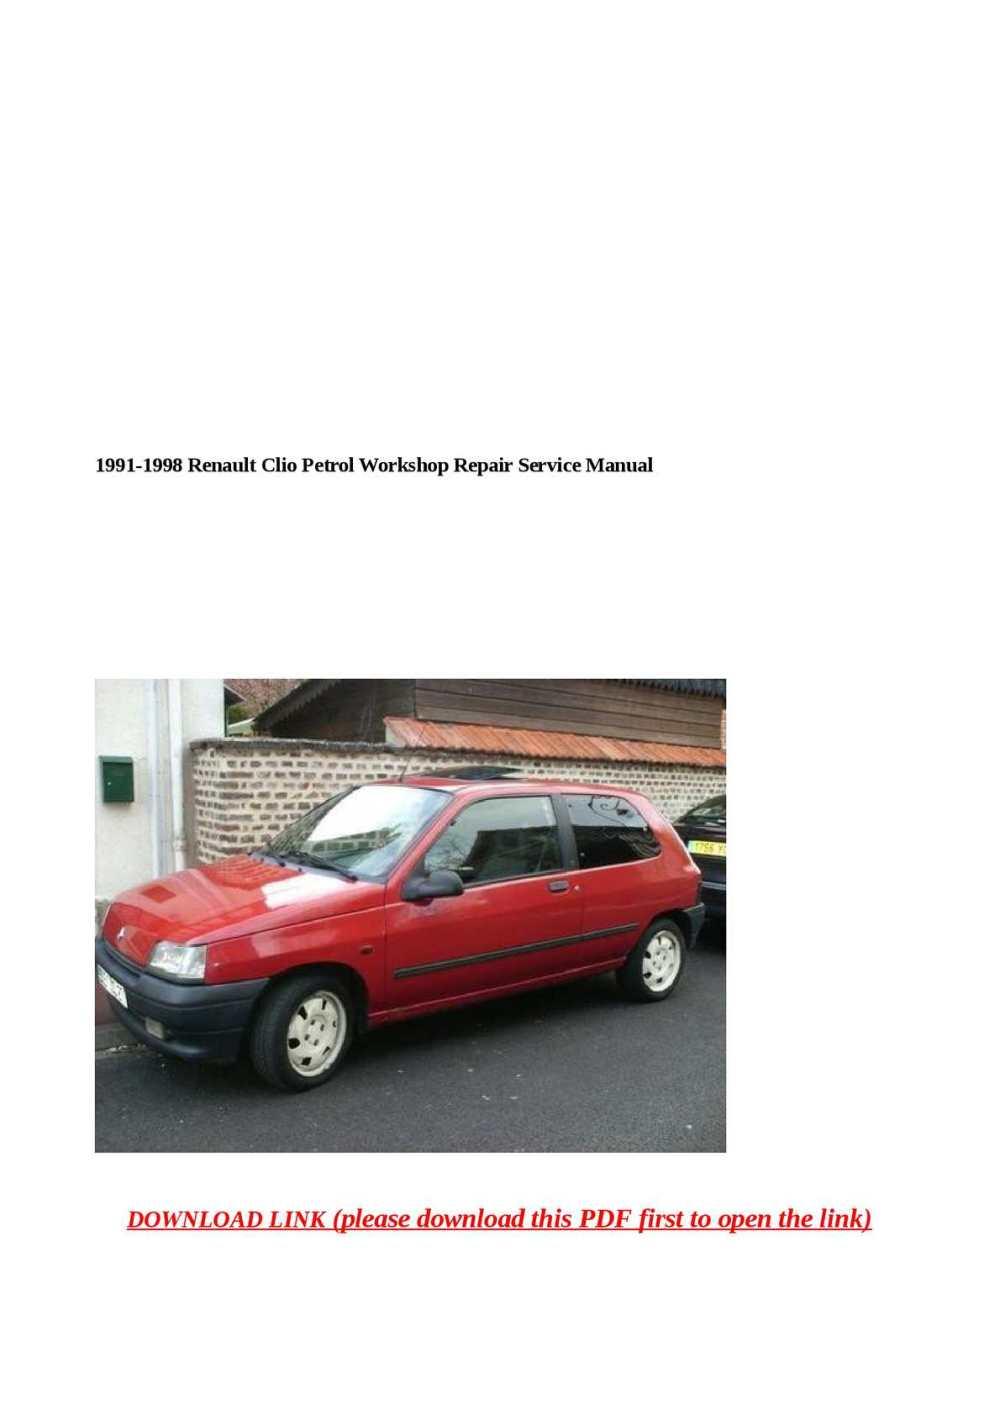 medium resolution of 1991 1998 renault clio petrol workshop repair service manual